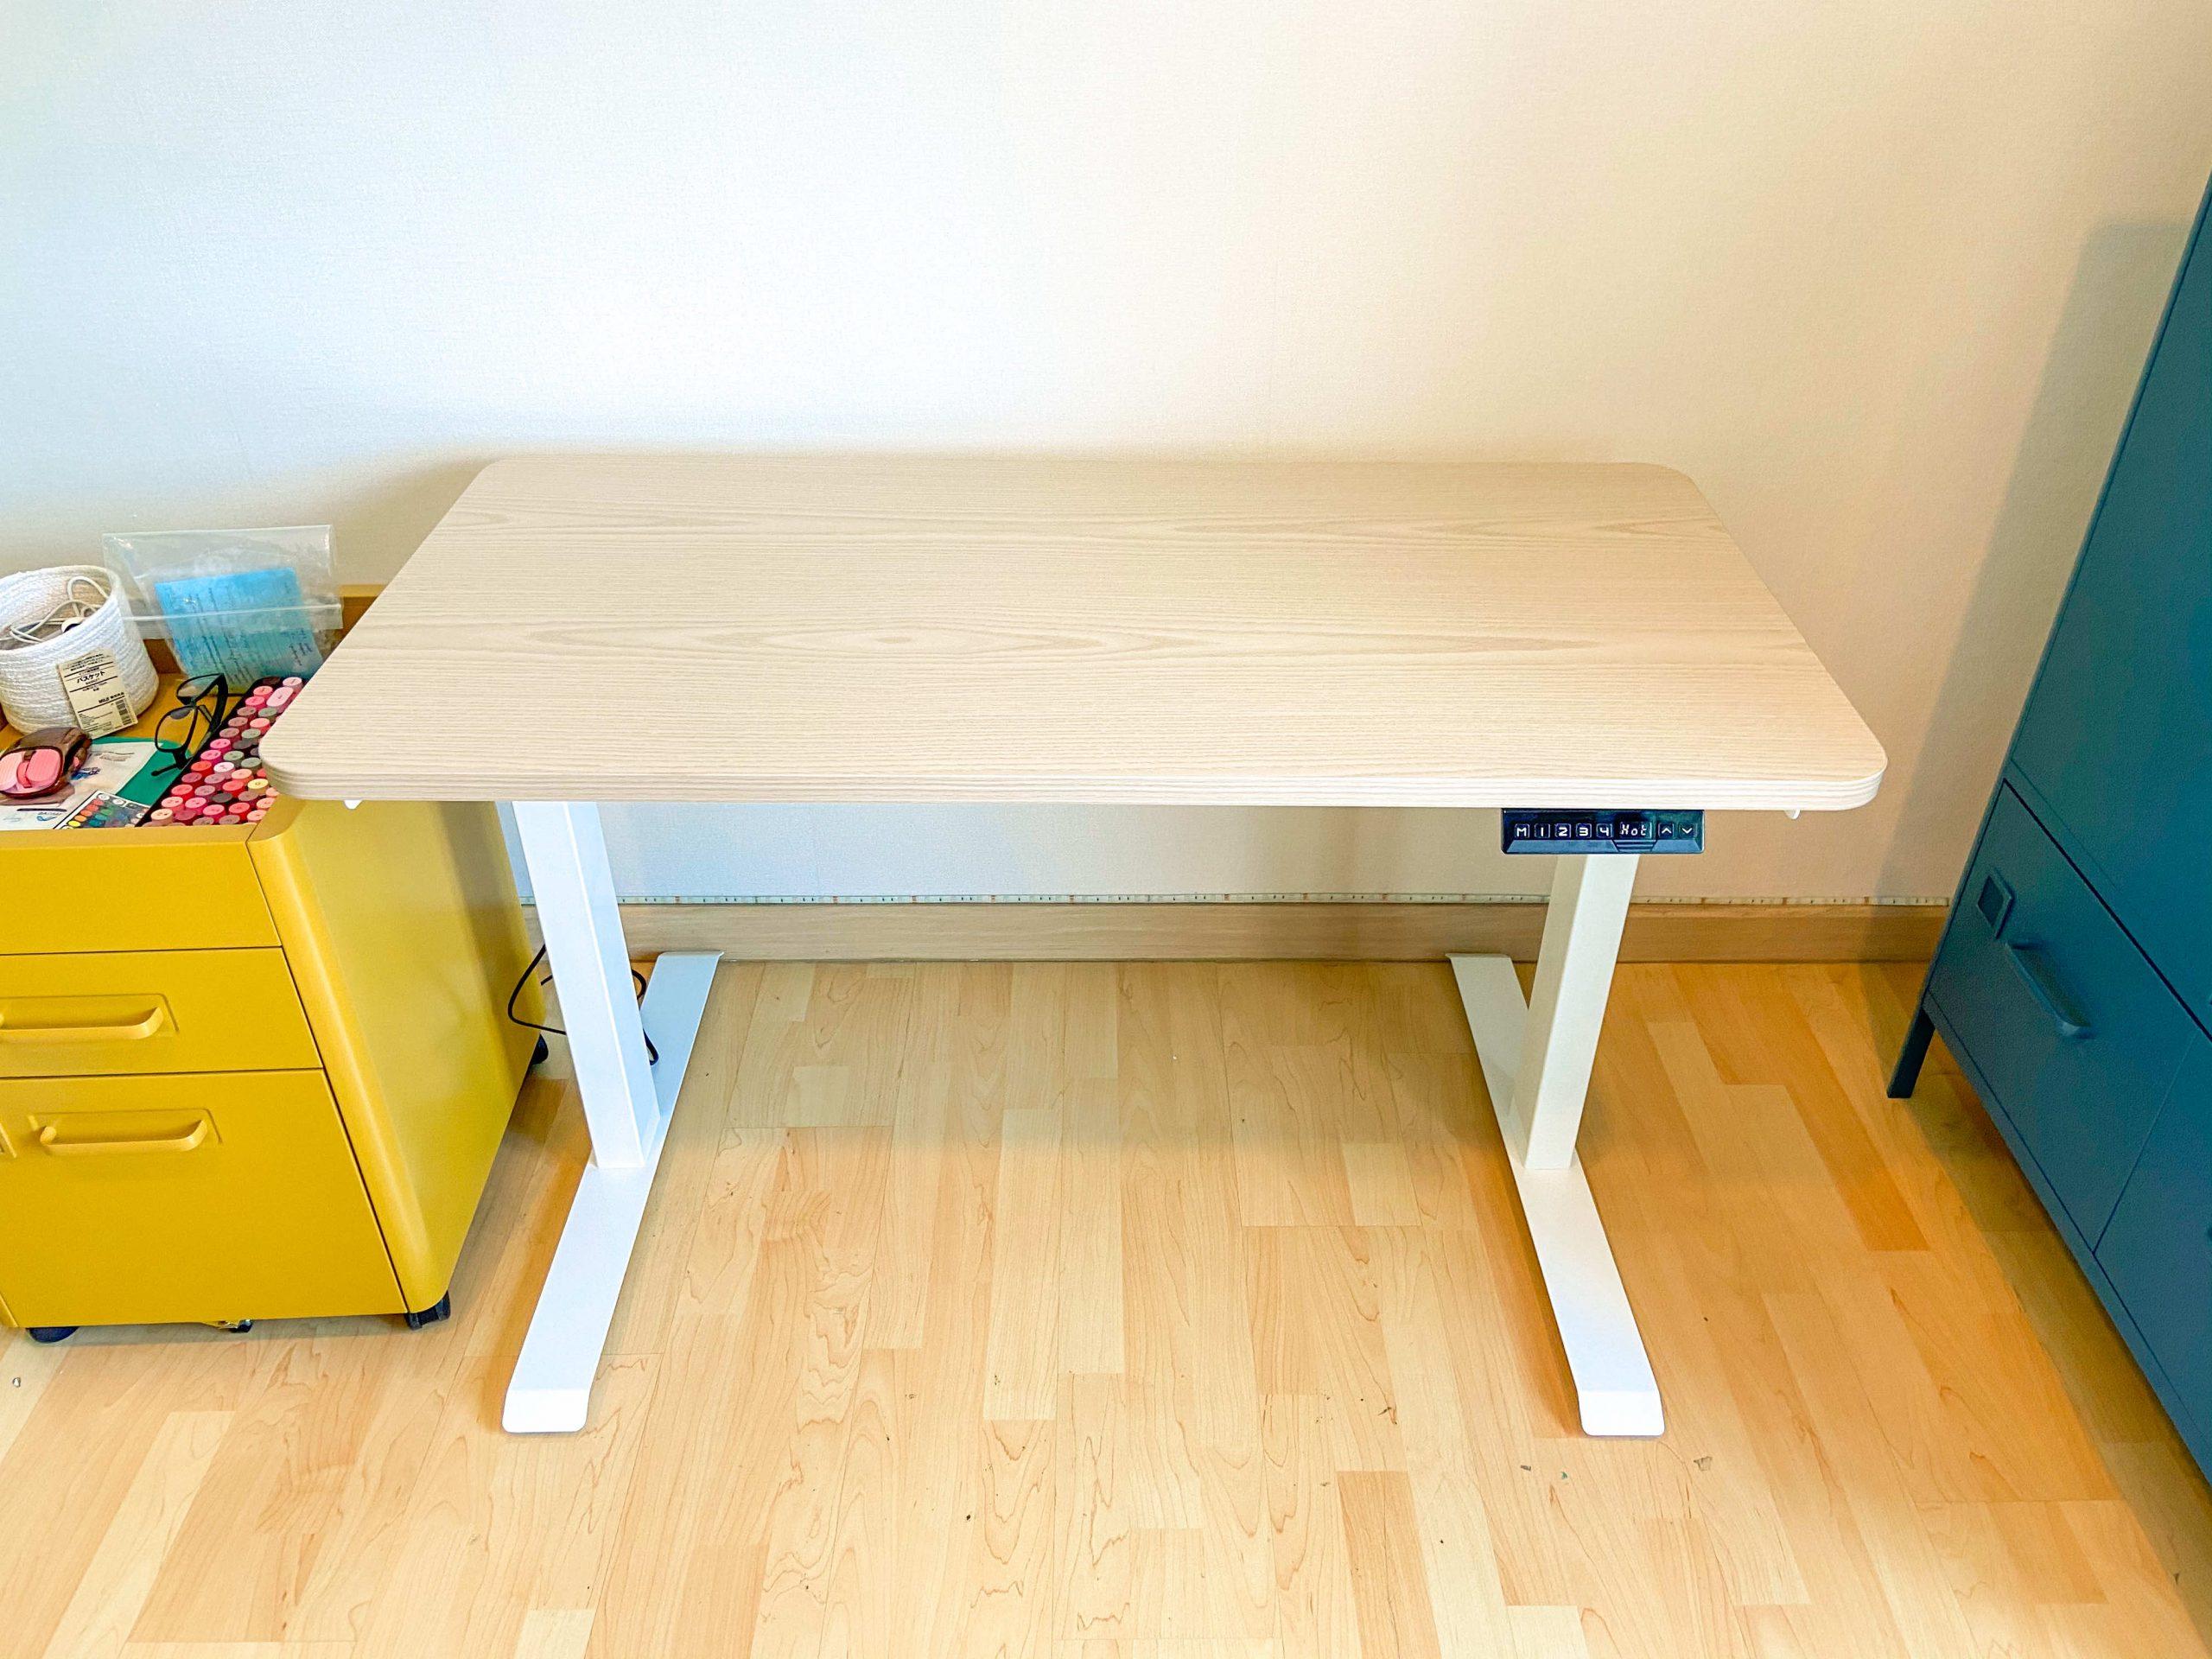 ergonomic adjustable table สี โต๊ะปรับระดับ mitz